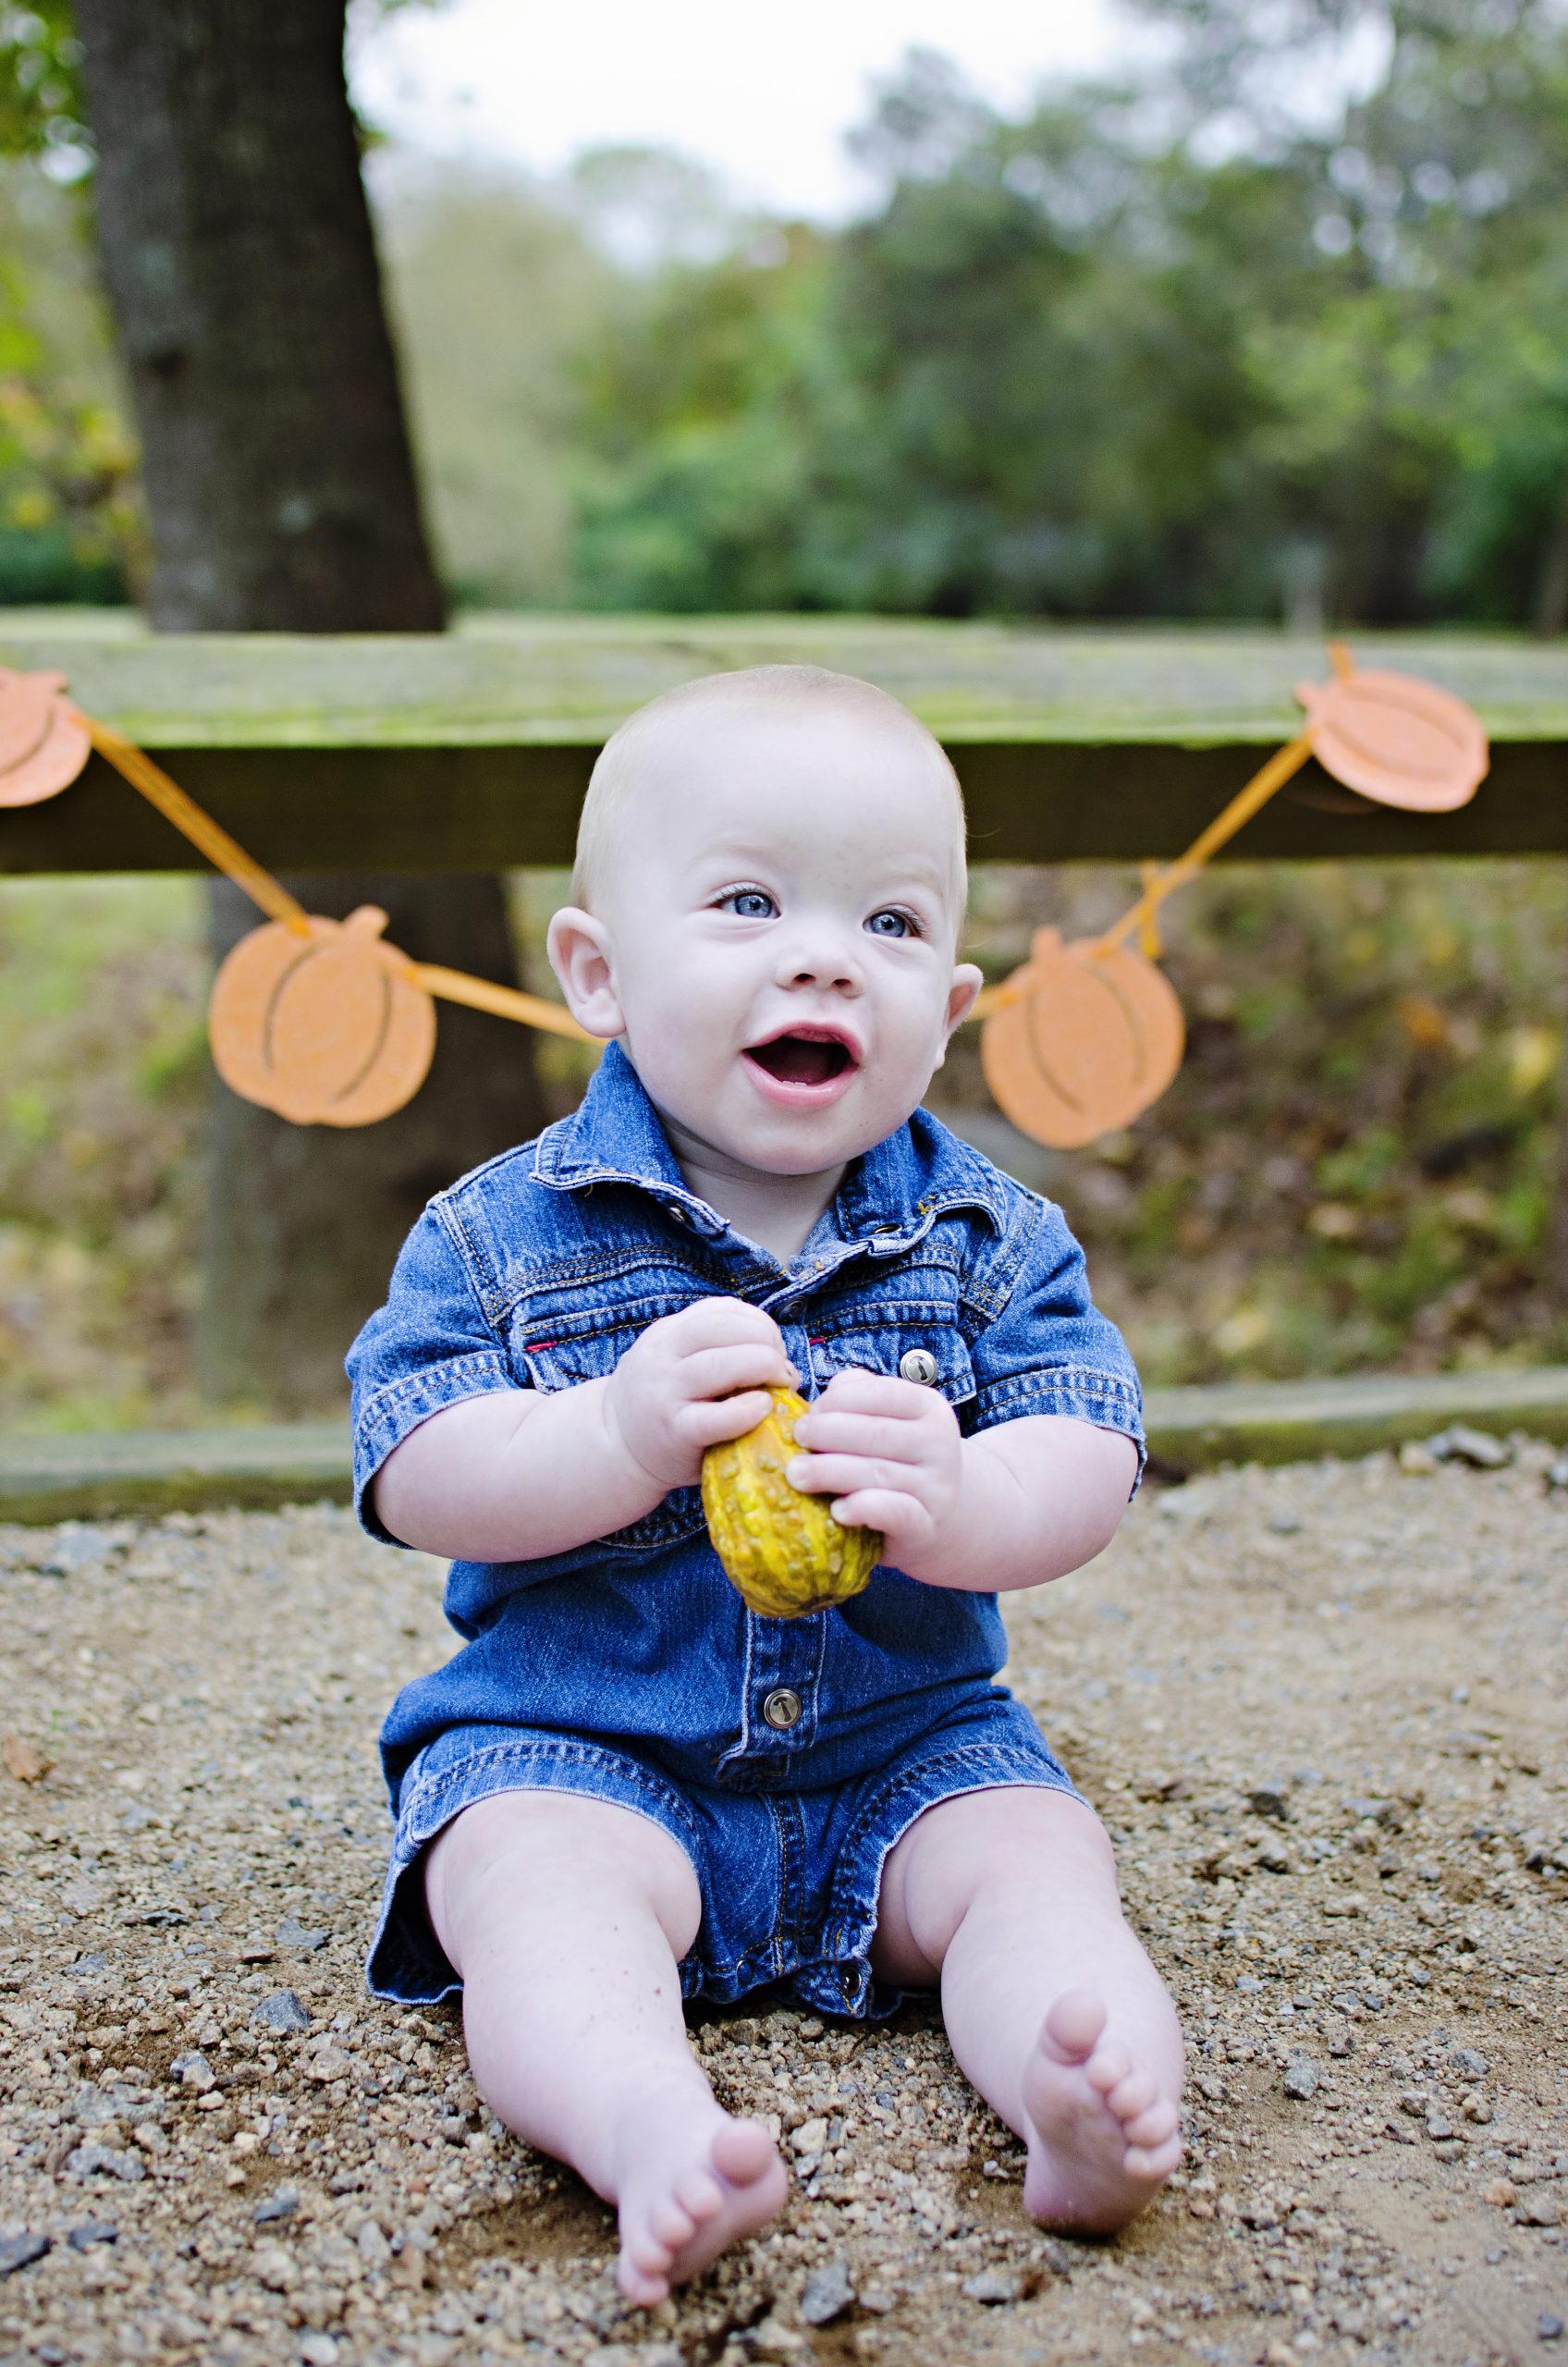 edit3-scaled Newborn Necessities for an Autumn Boy